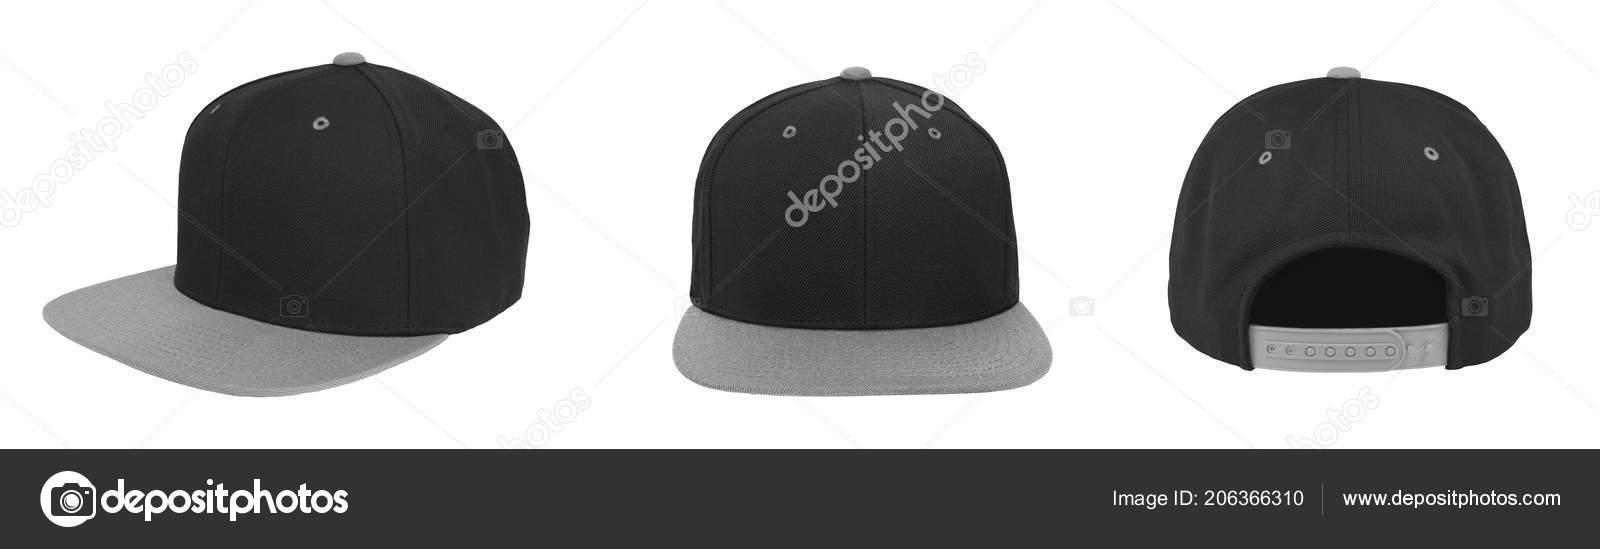 Béisbol Blanco Snapback Gorra Dos Tonos Color Negro Gris Sobre — Foto ... 79ab4a570ba